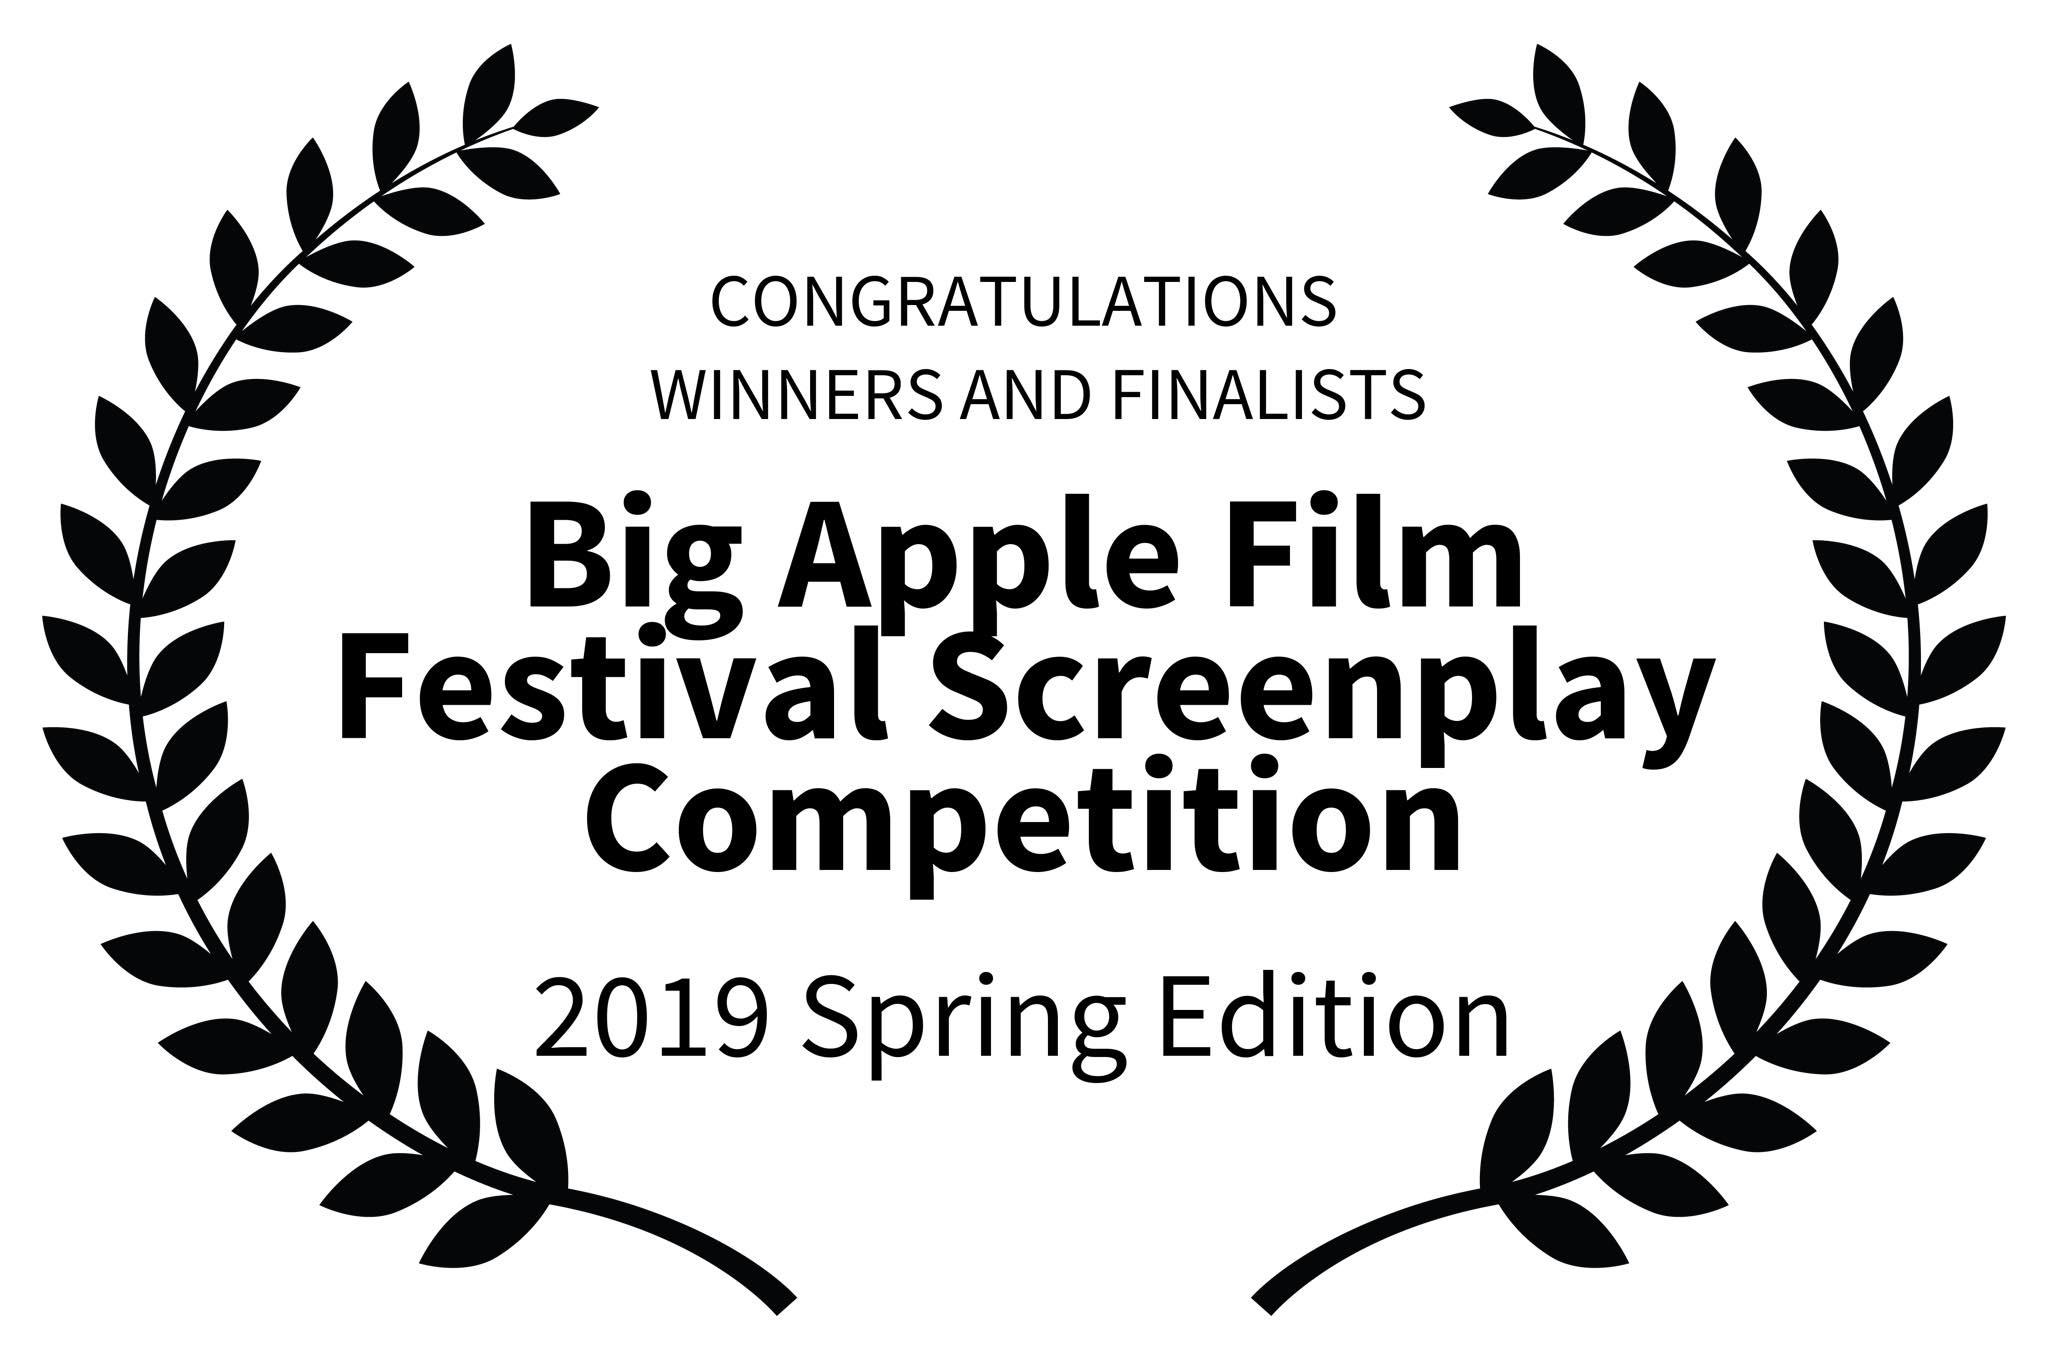 BigAppleFilmFestival-Award.jpg